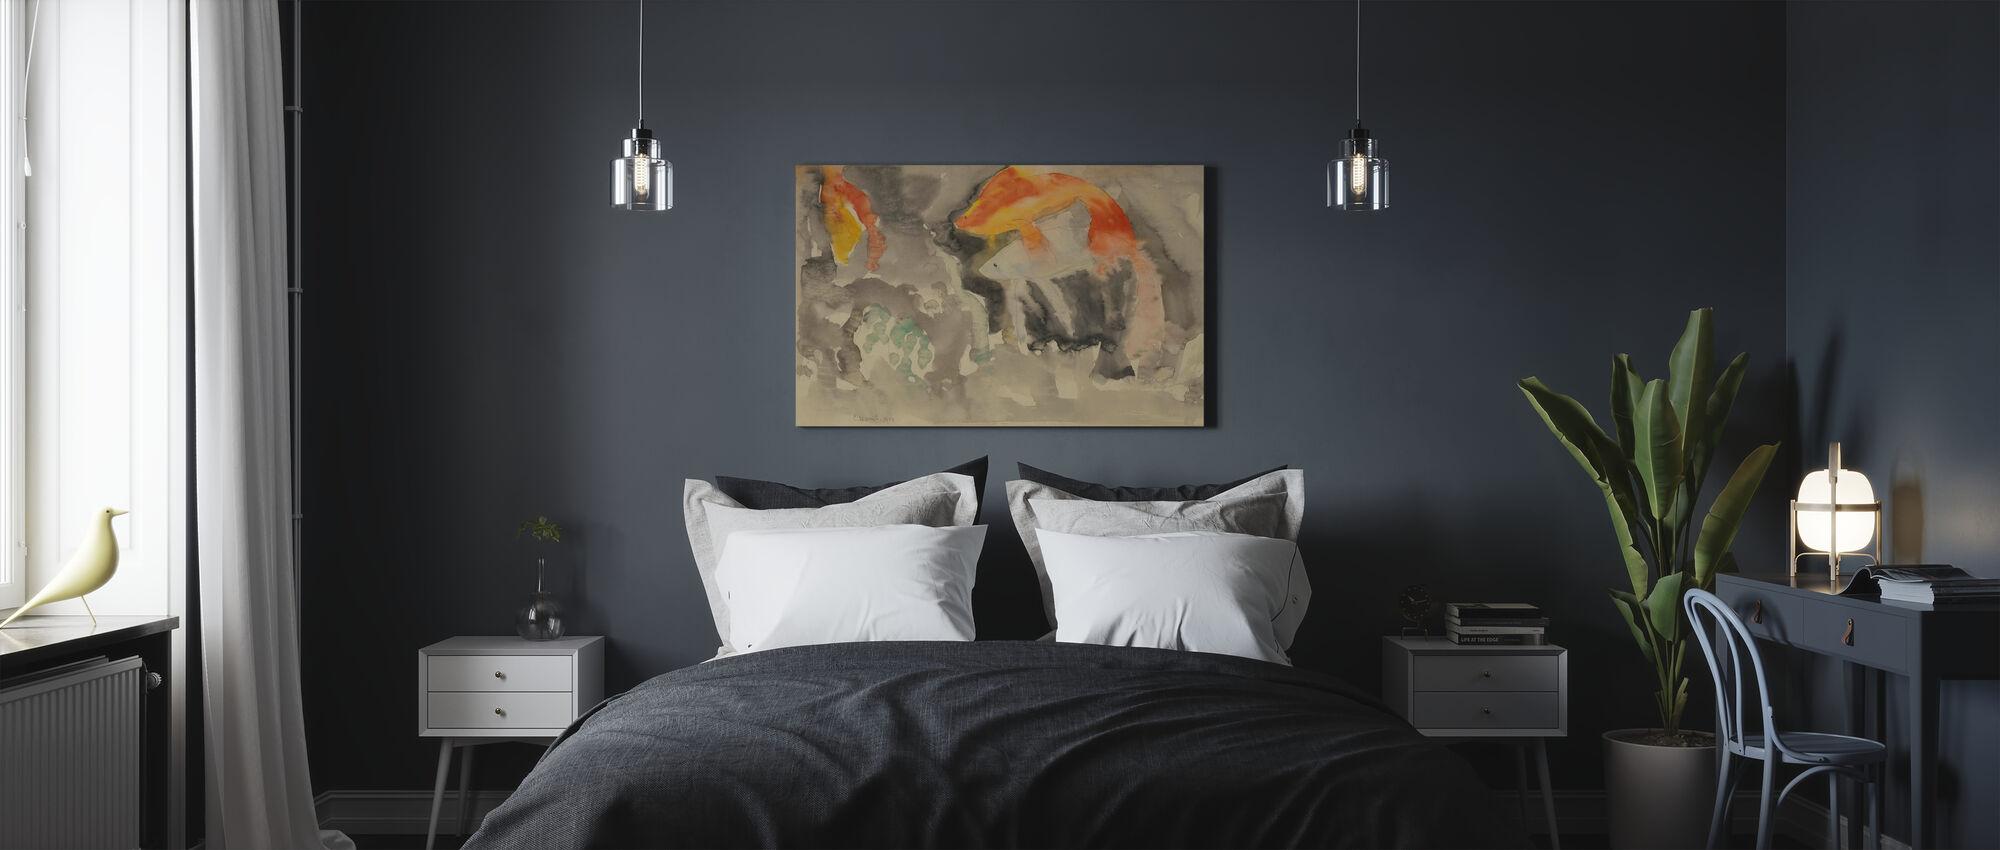 Fish Series No 5 - Charles Demuth - Canvas print - Bedroom